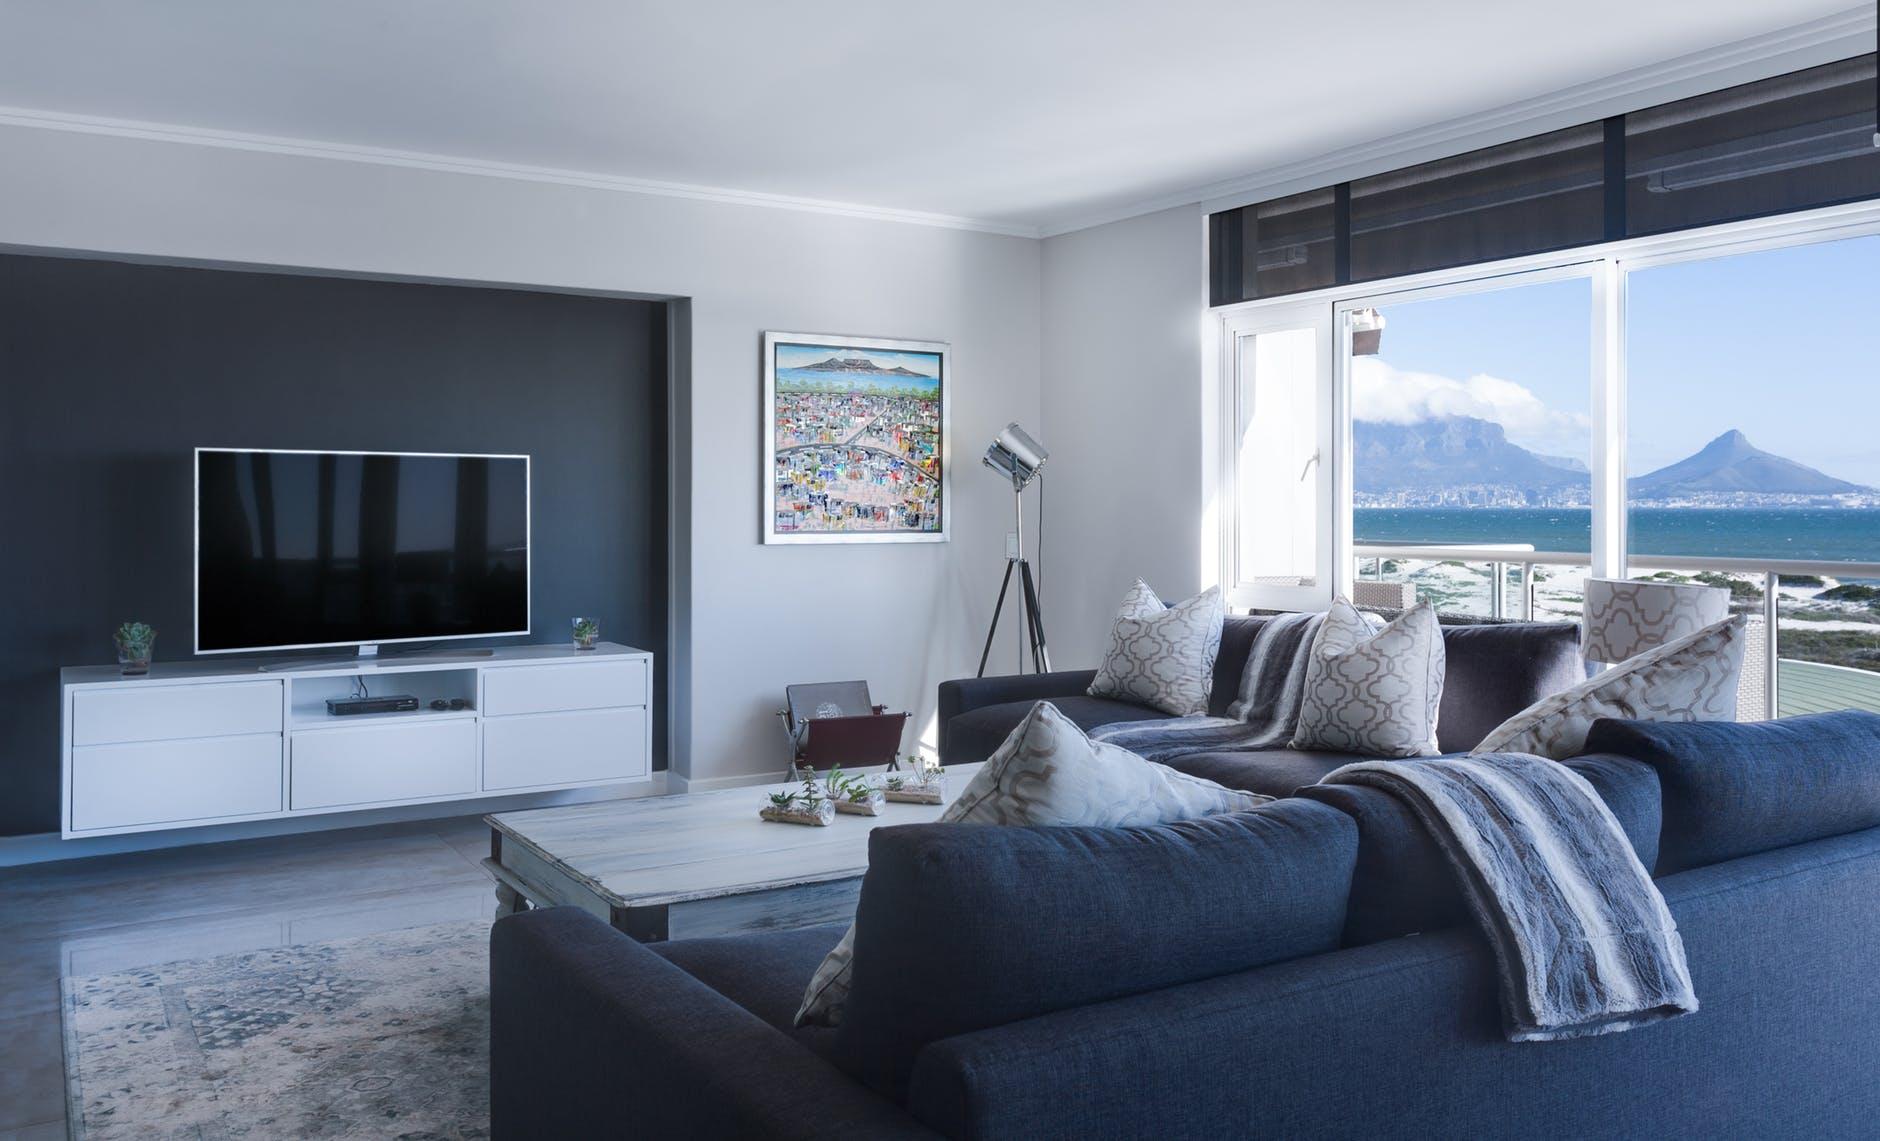 pexels photo 1457842 1 Top 10 Living Room Design